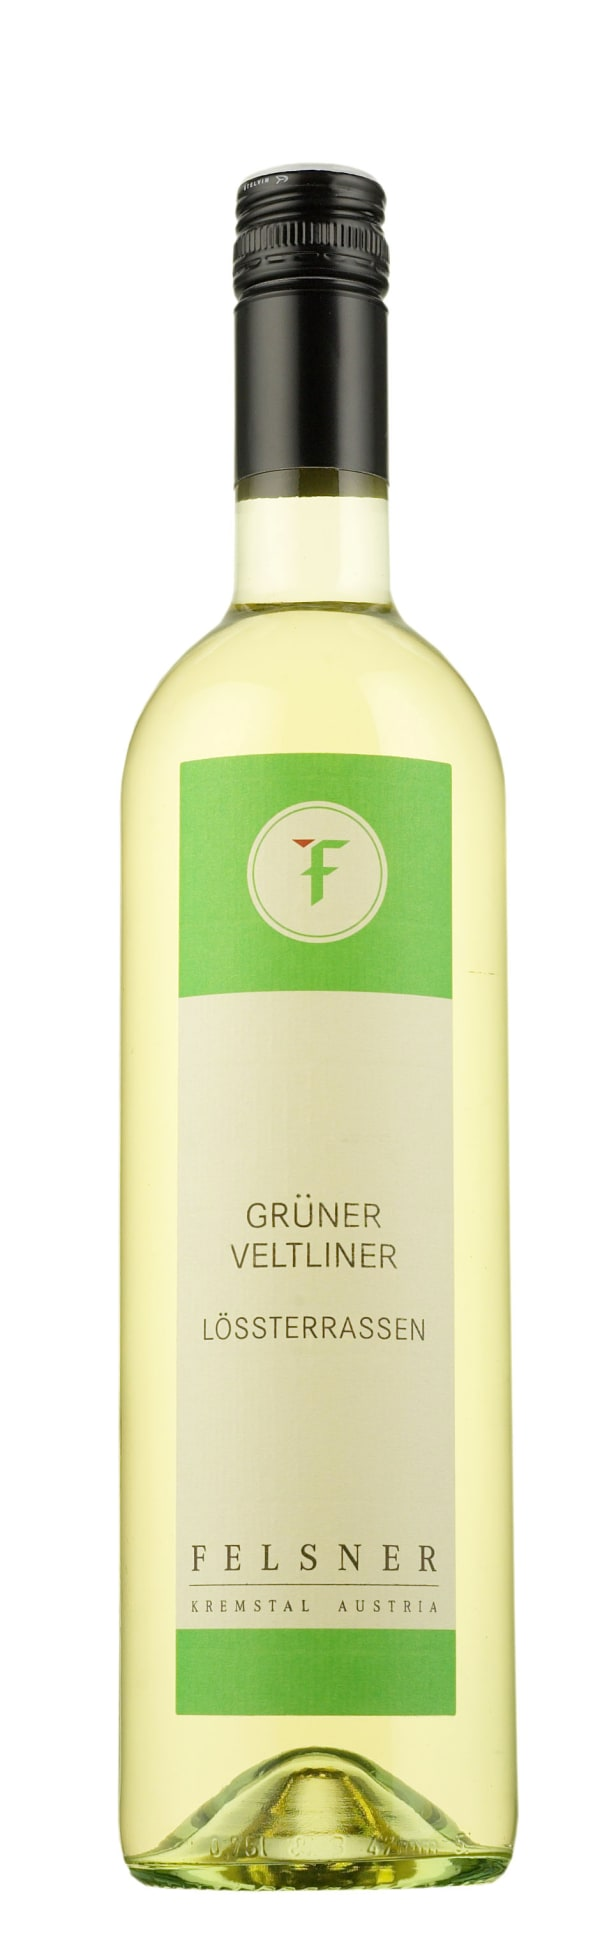 Felsner Lössterrassen Grüner Veltliner 2015